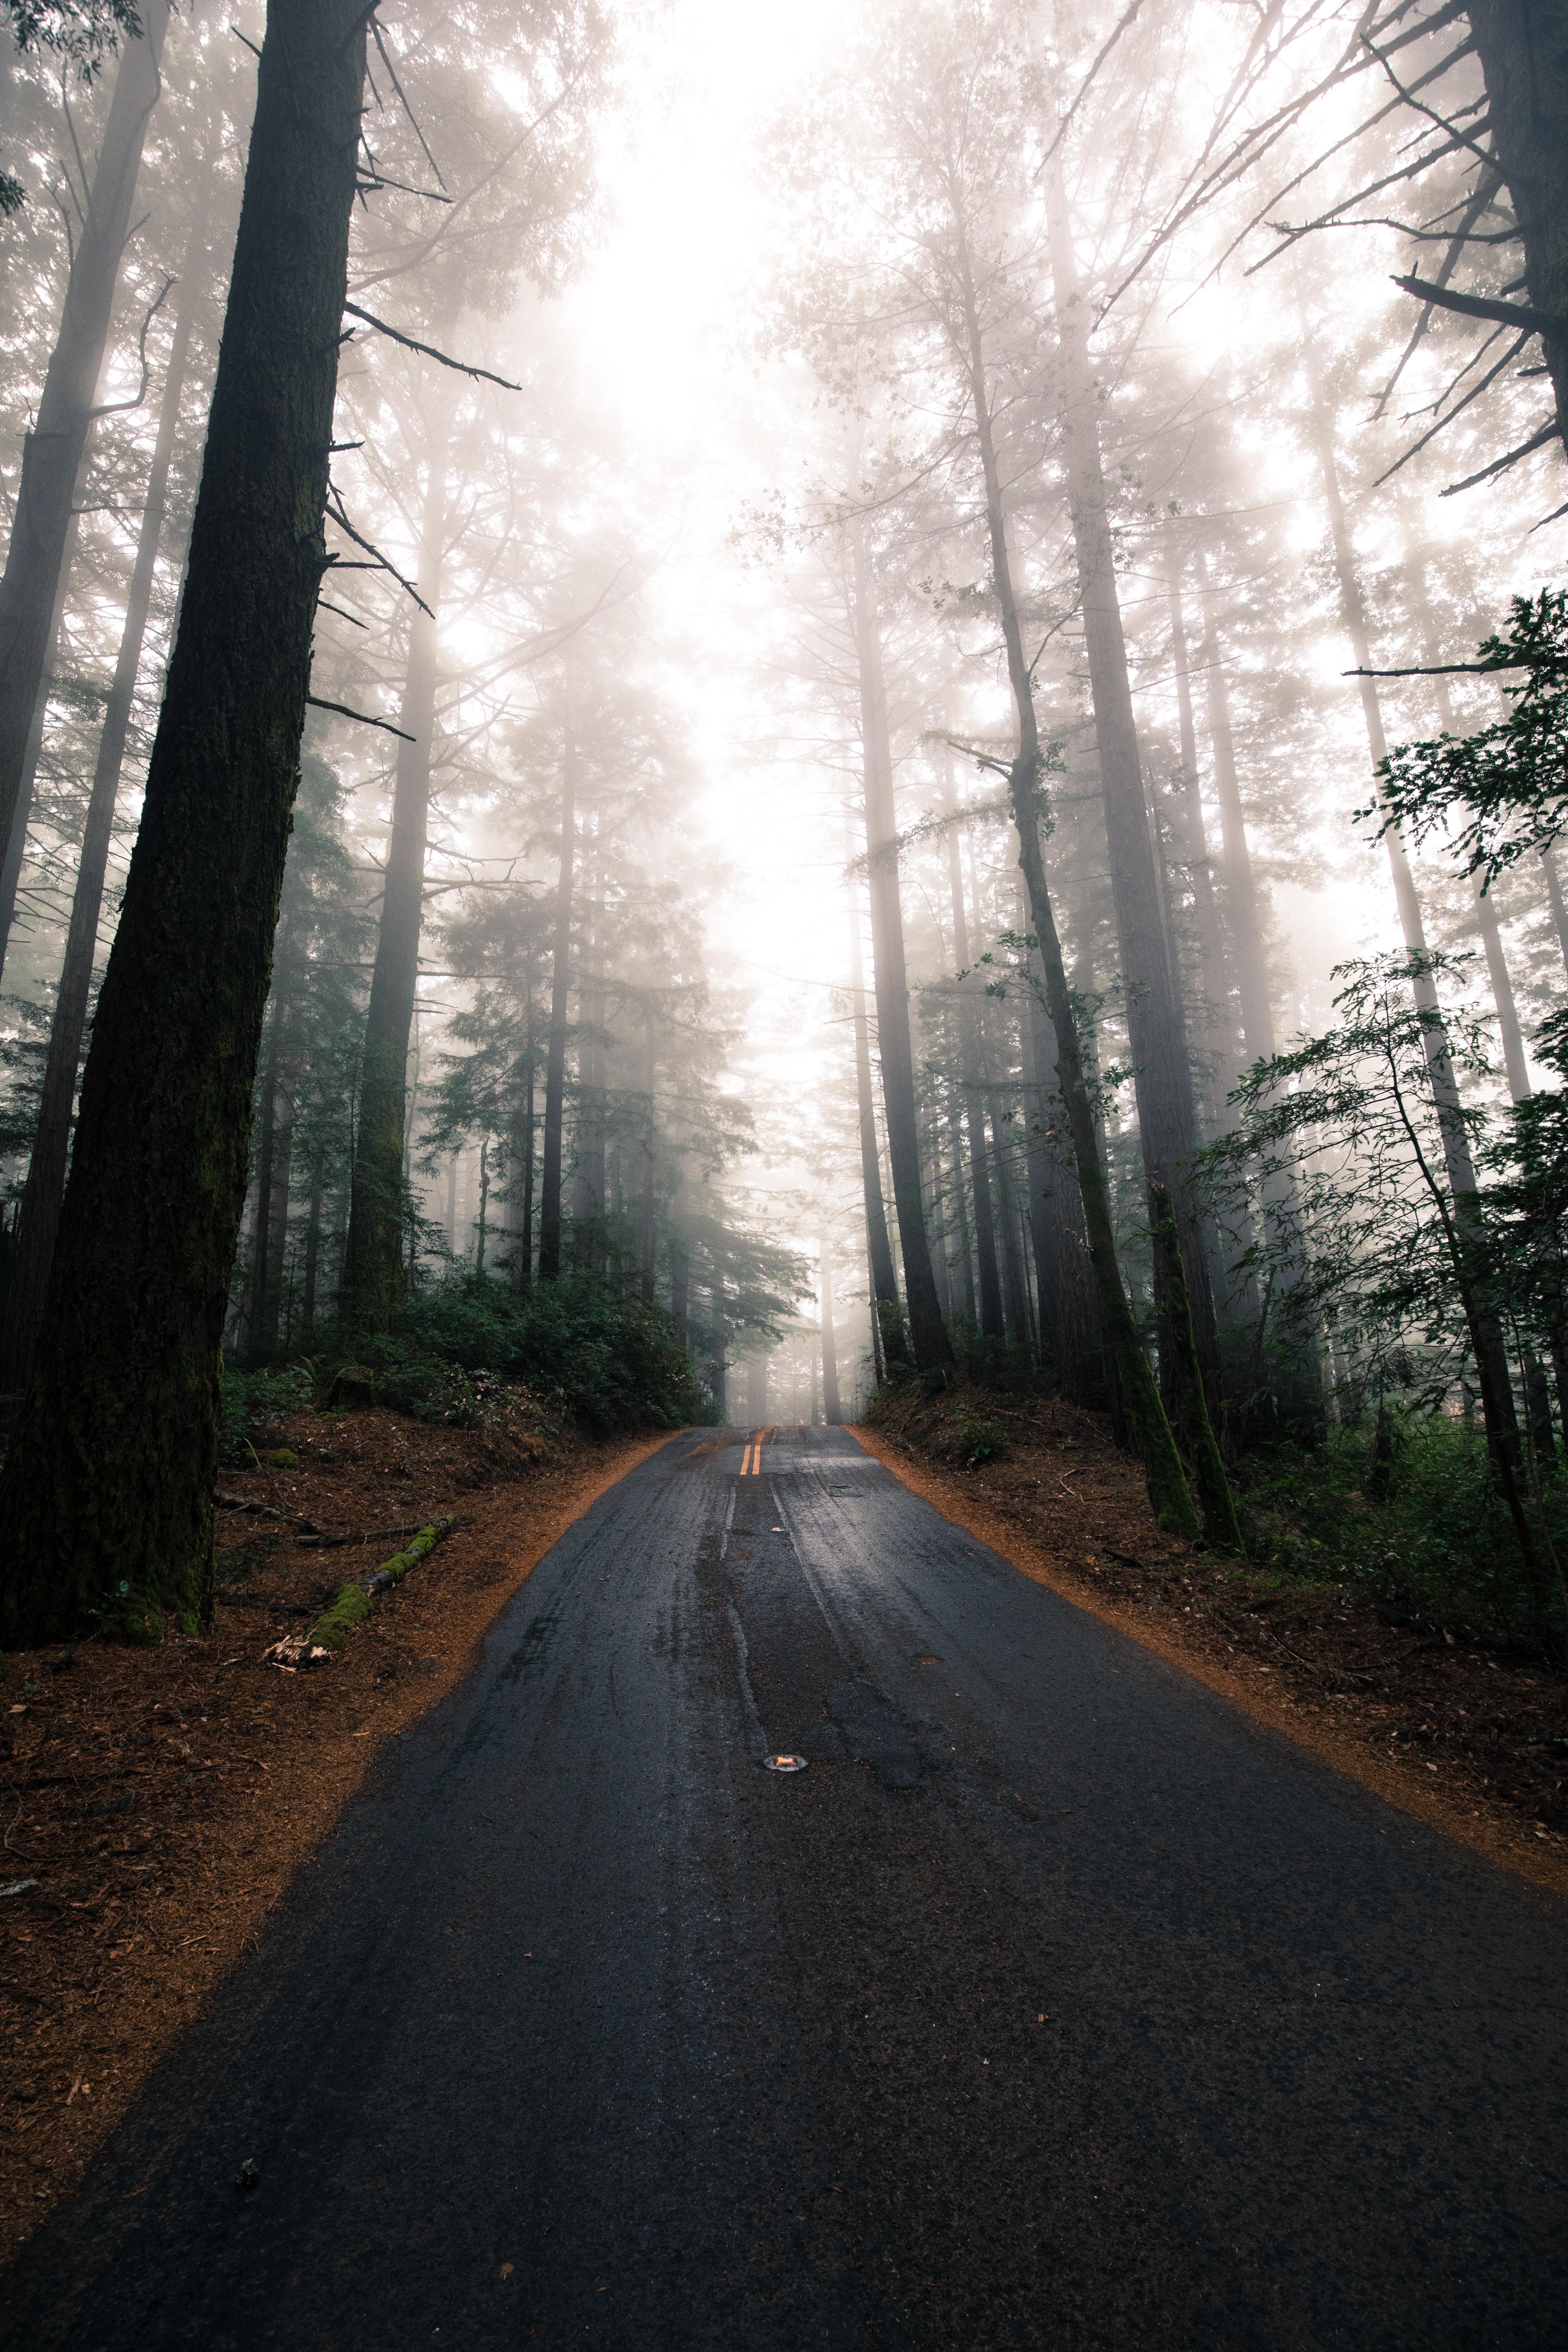 gray asphalt between green trees